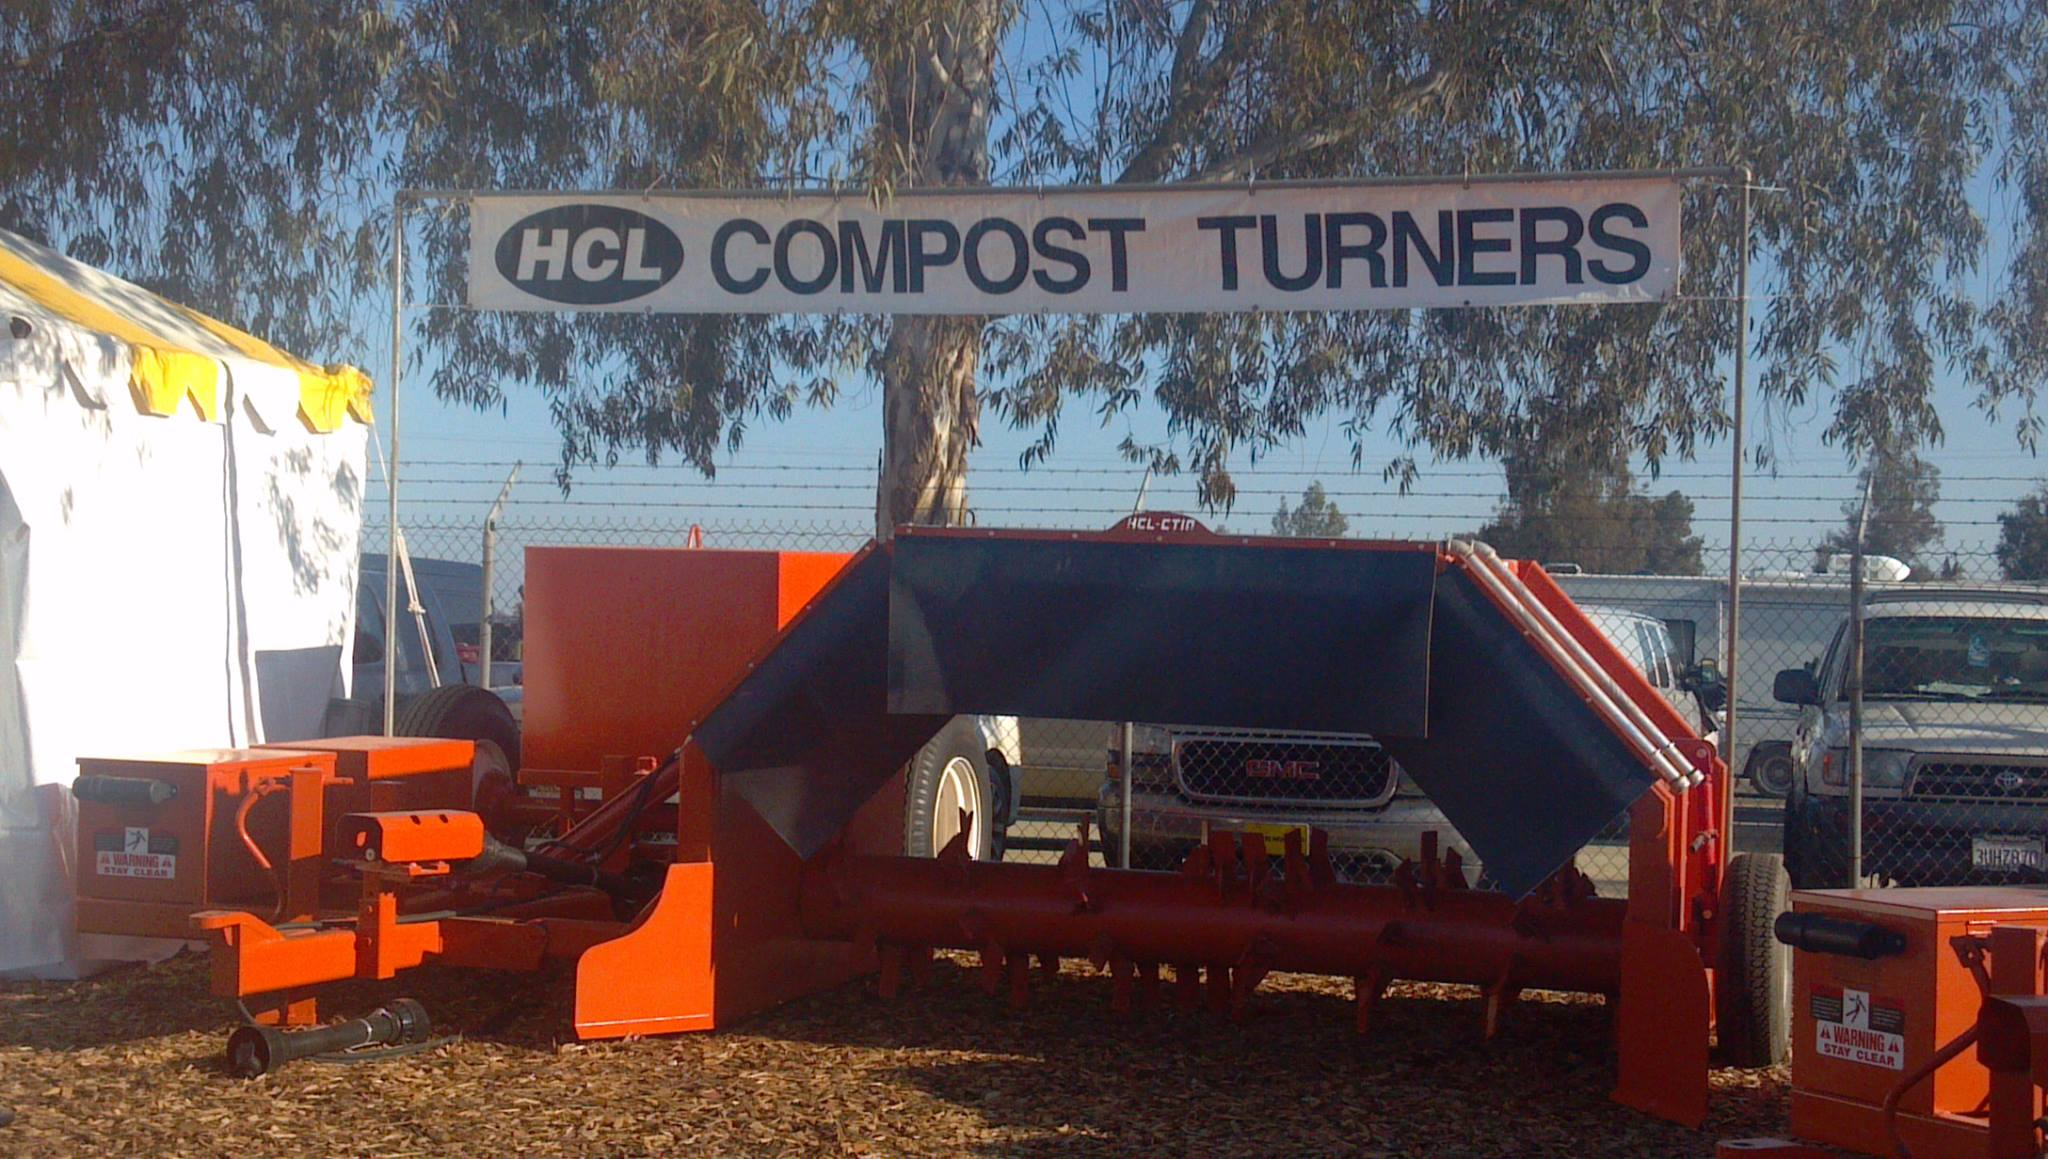 Compost Turner